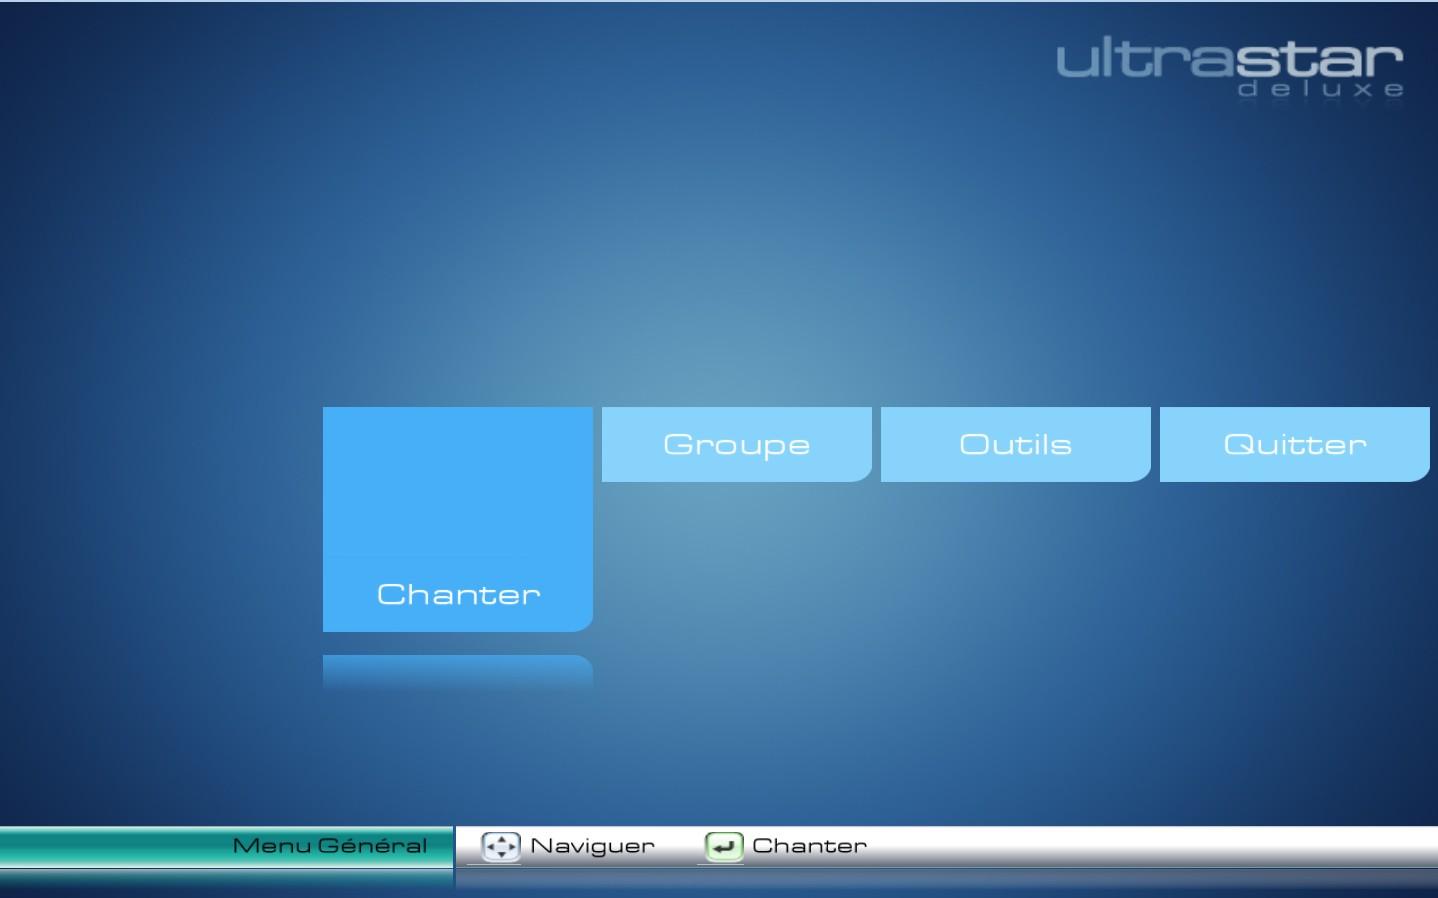 fichier texte ultrastar